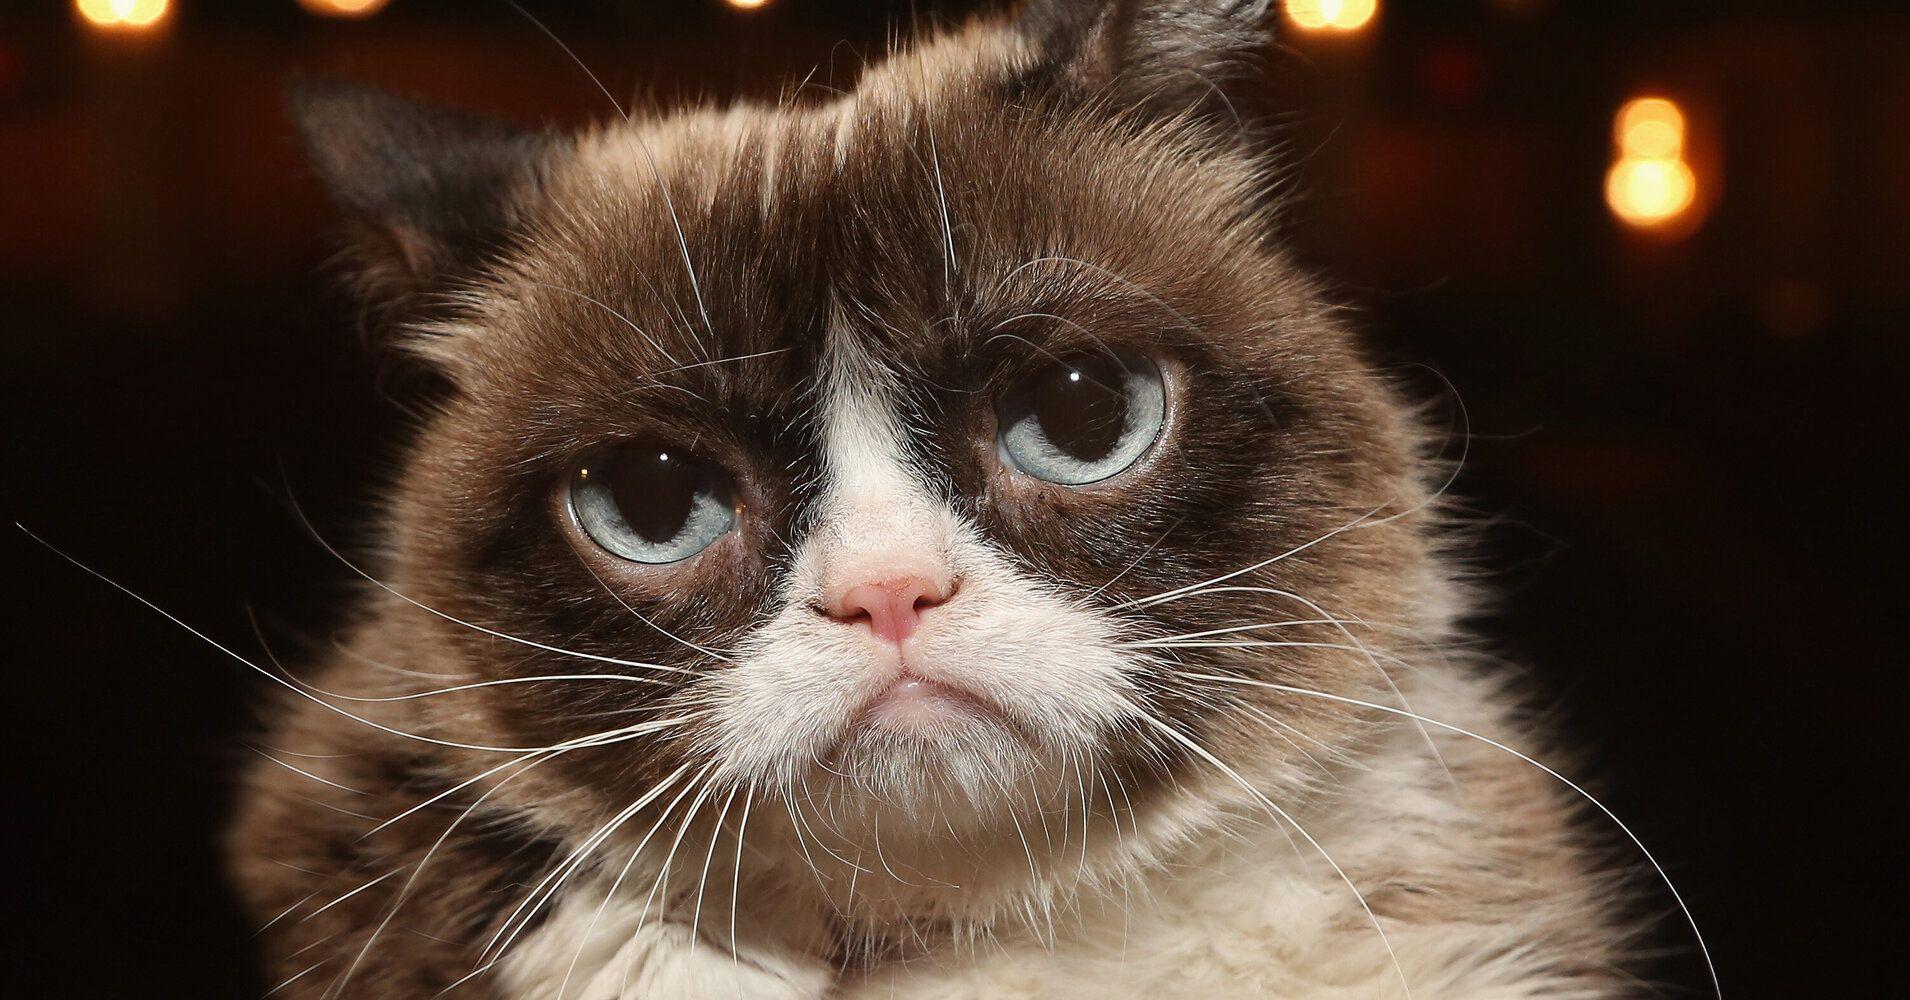 Internet Sensation Grumpy Cat Has Died | Grumpy cat ...